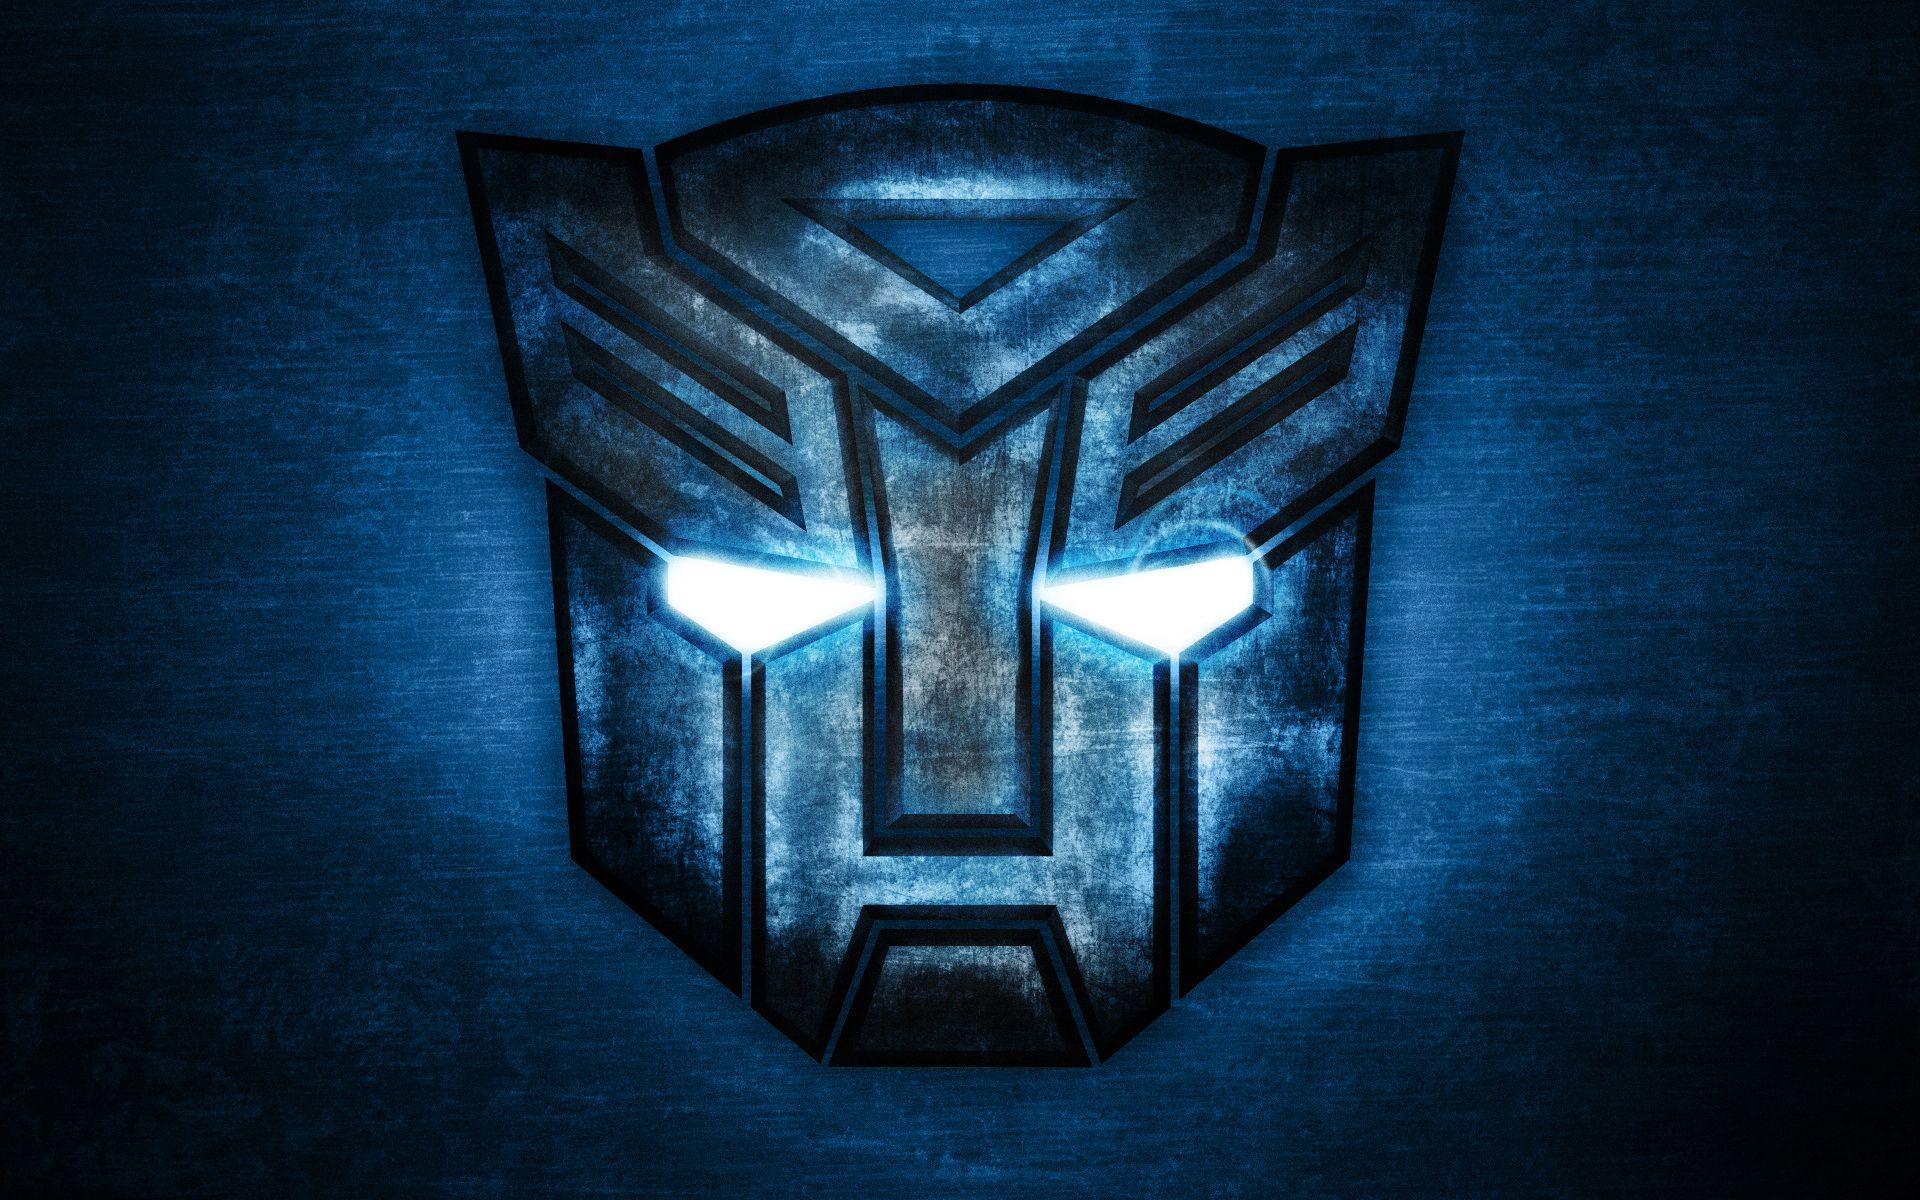 Autobots Gambar